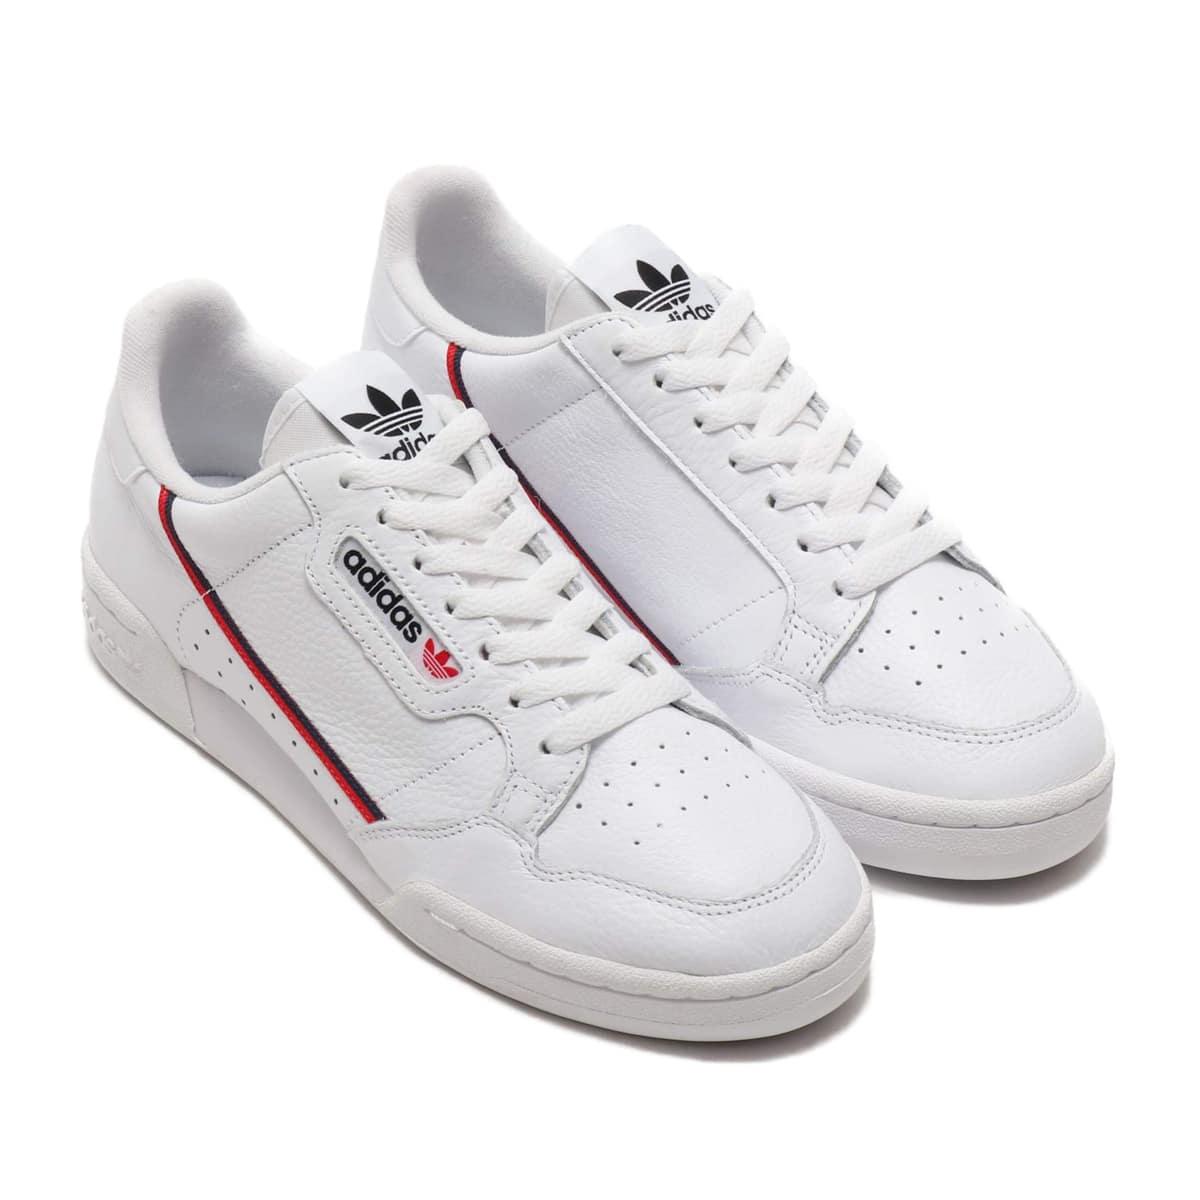 adidas Originals CONTINENTAL 80 RUNNING WHITE/SCARLET/COLLEGE NAVY 18FW-I_photo_large